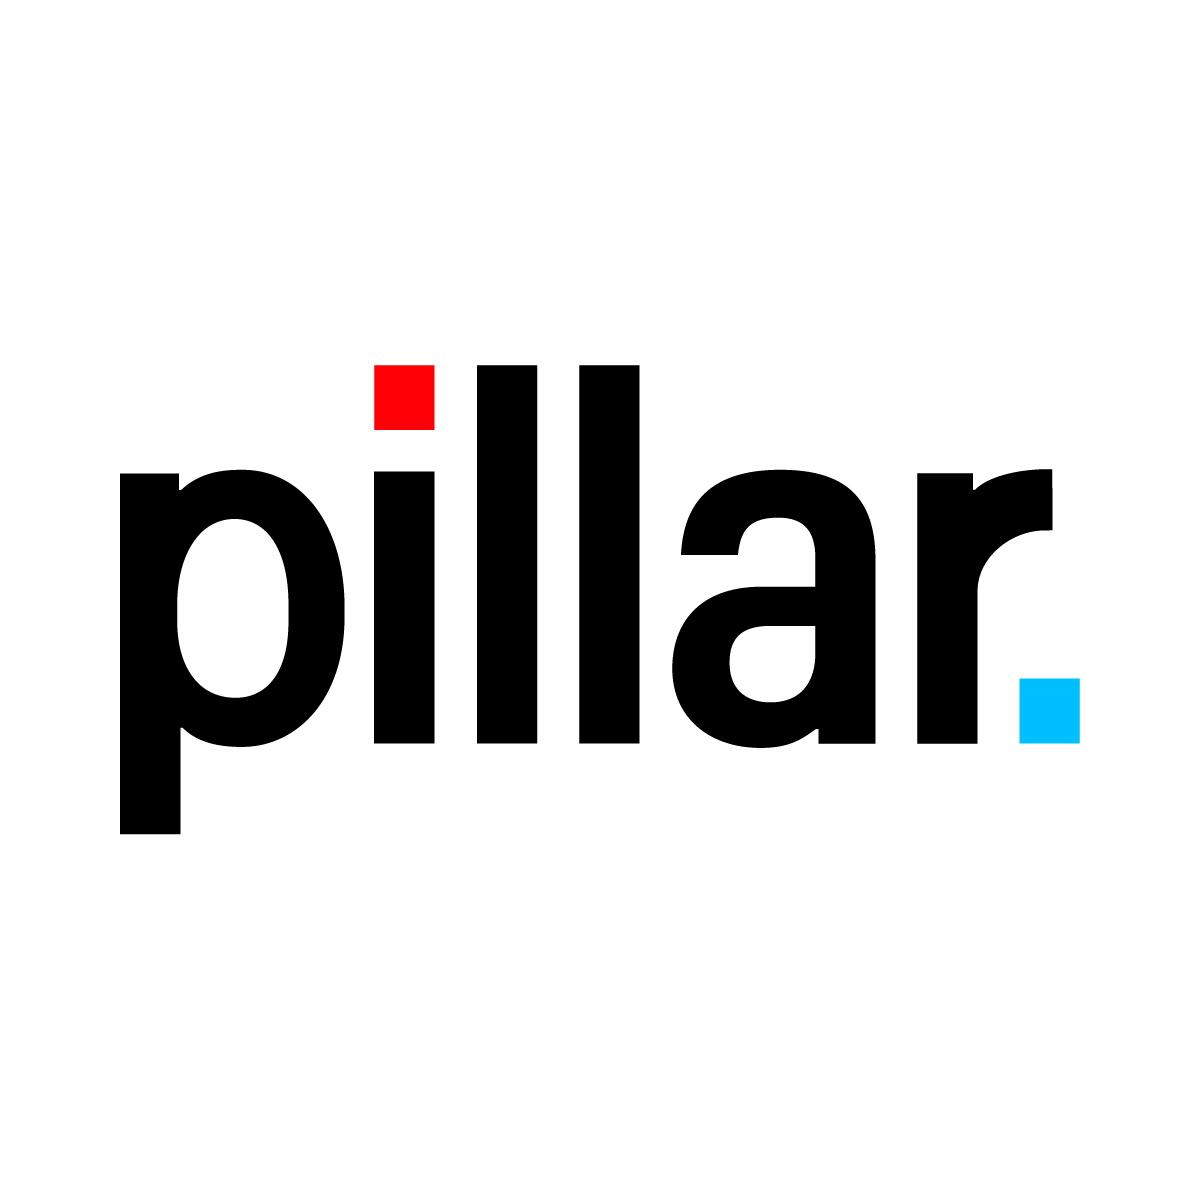 ELI5 Pillar (PLR)Cryptocurrency